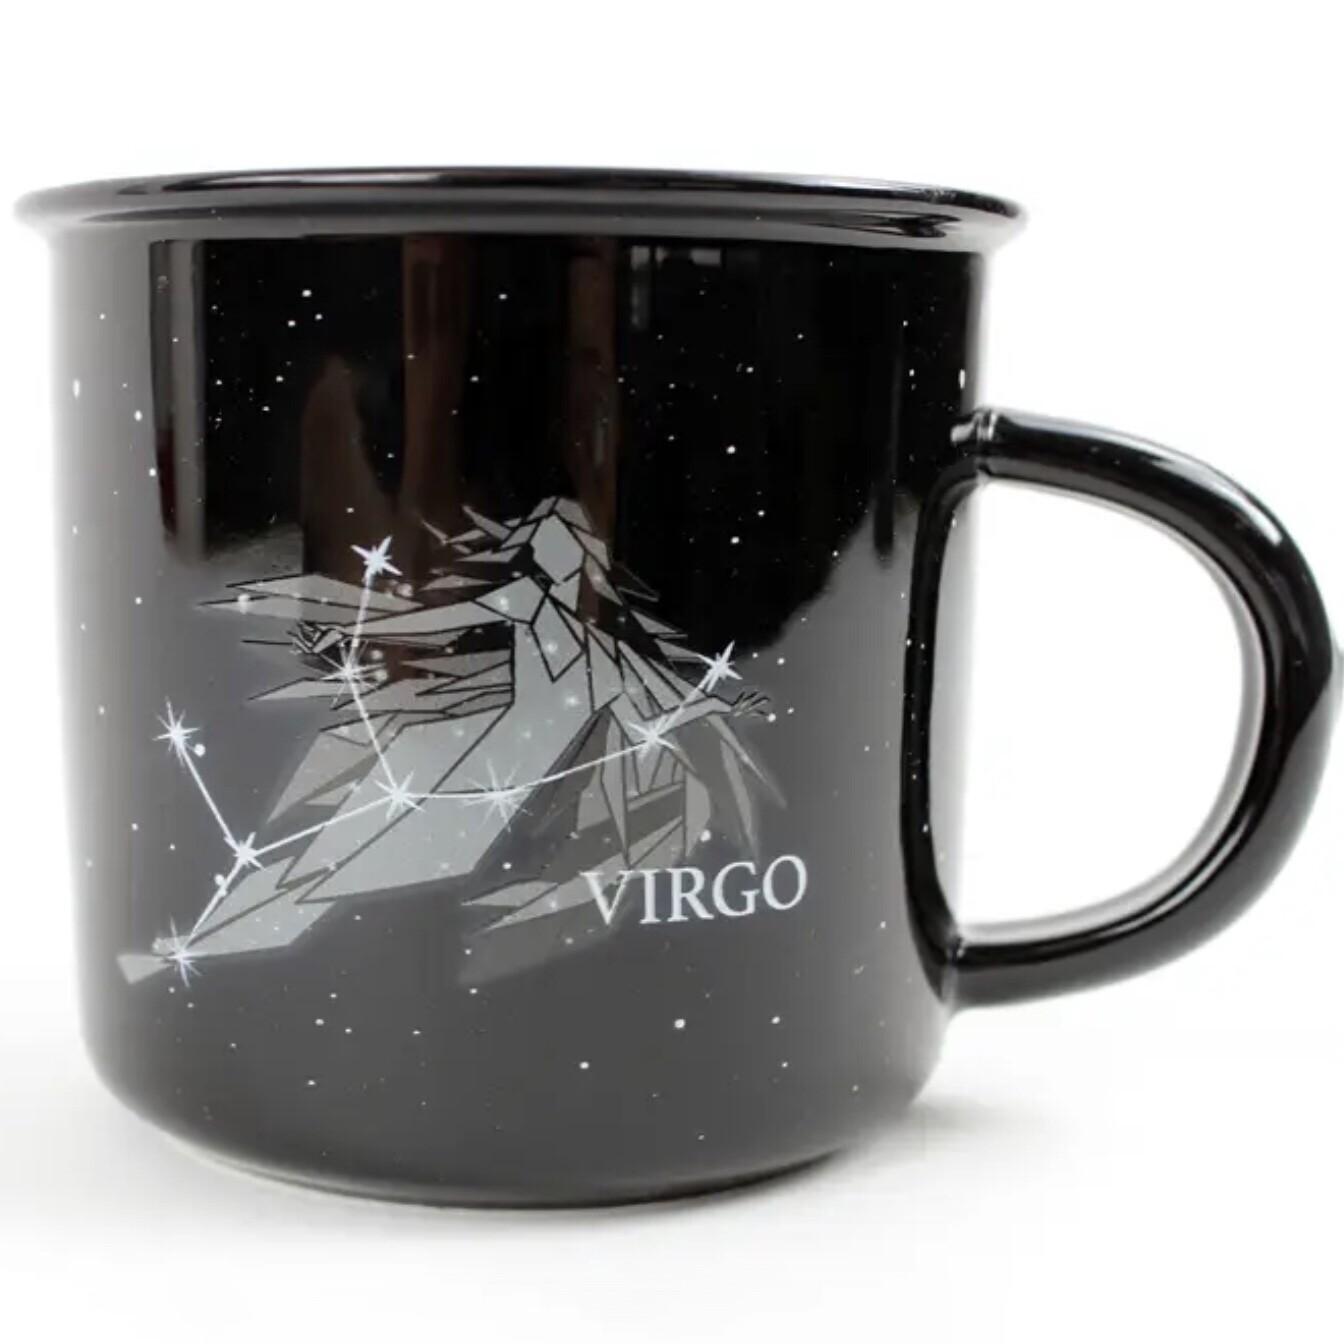 Virgo Constellation Ceramic Camp Mug